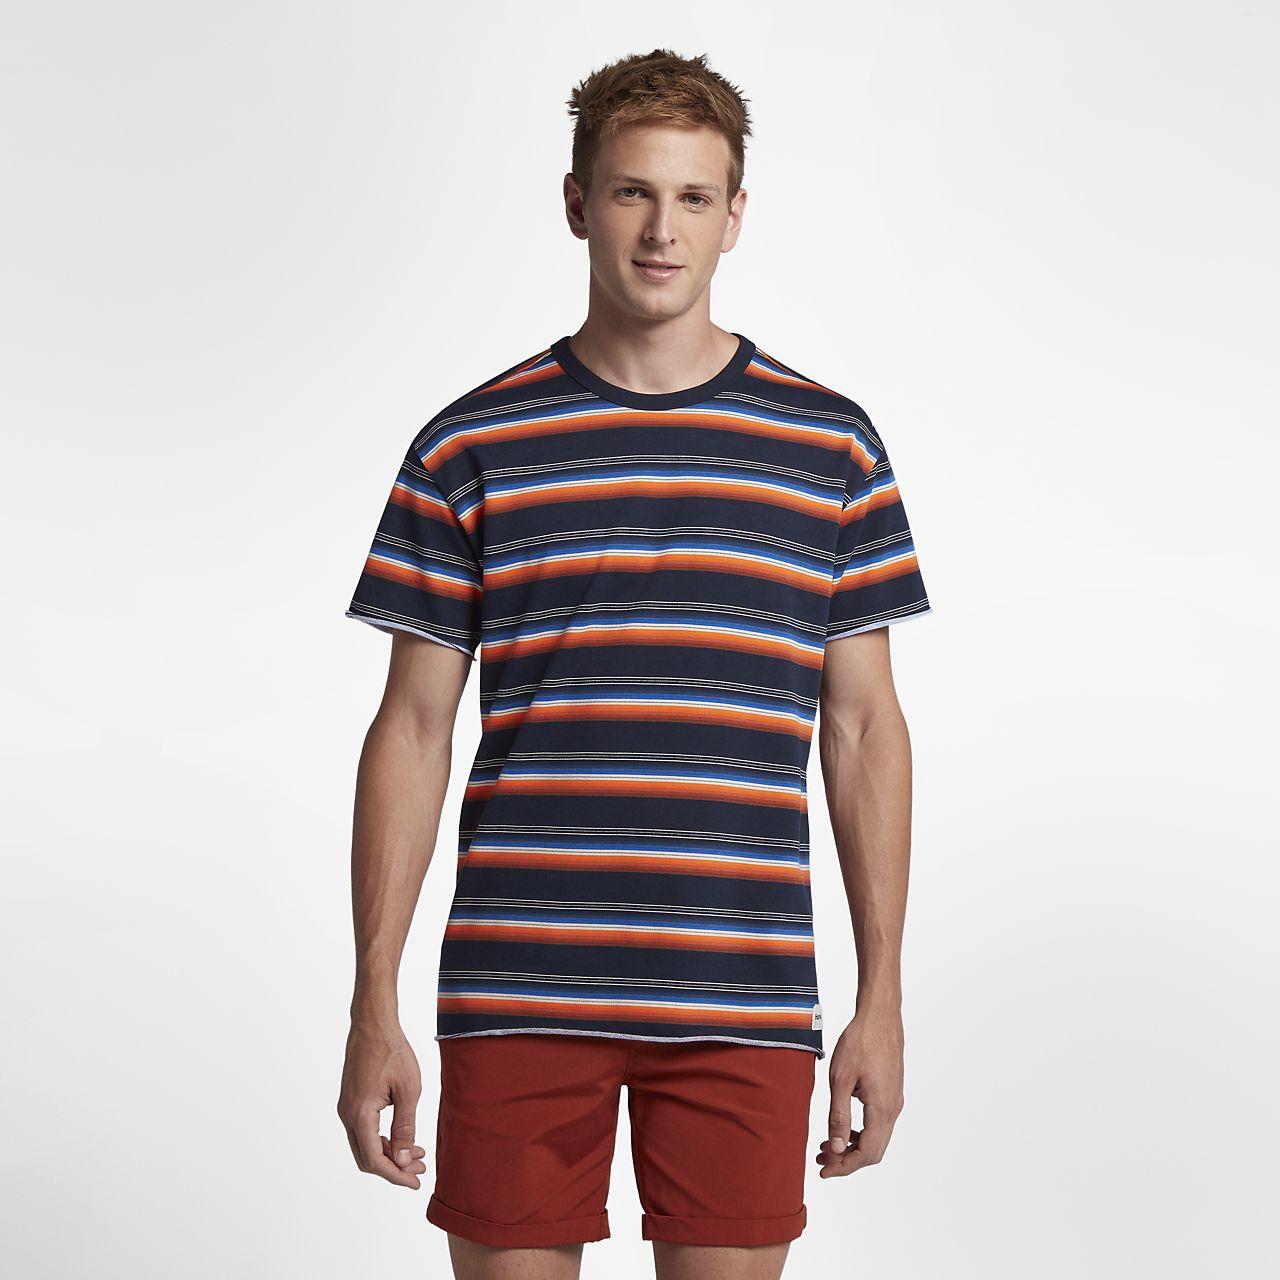 Hurley Serape Men's T-Shirt